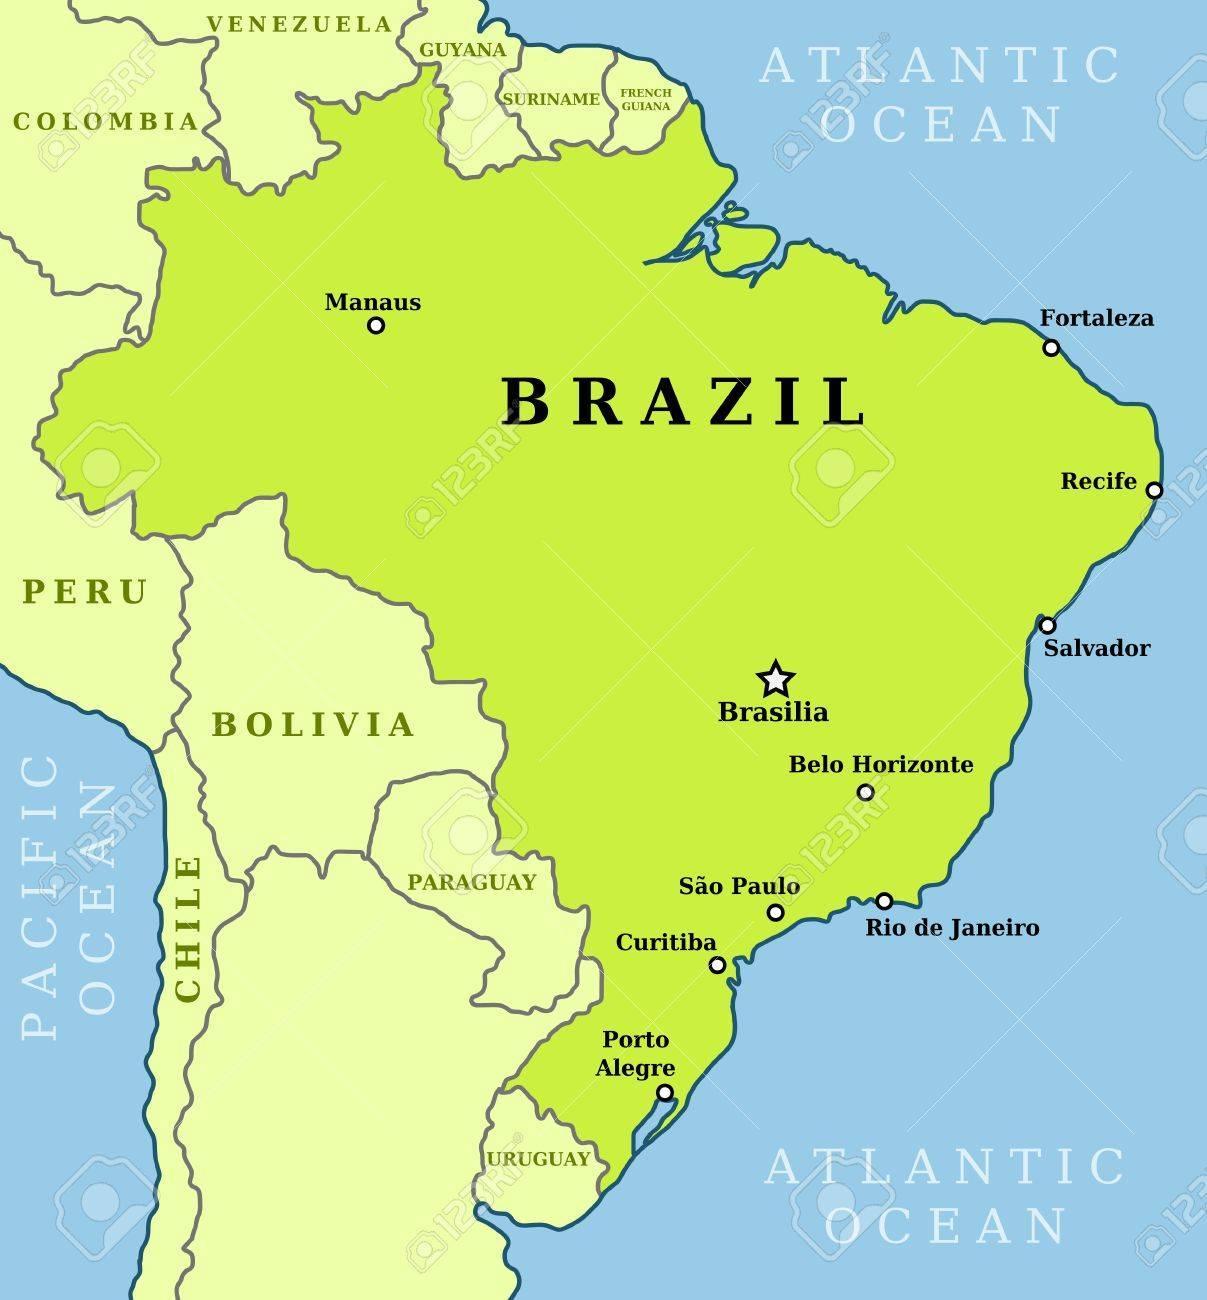 Map Of Brazil Cities Brazil Map Of Cities South America Americas - Map of brazil with cities